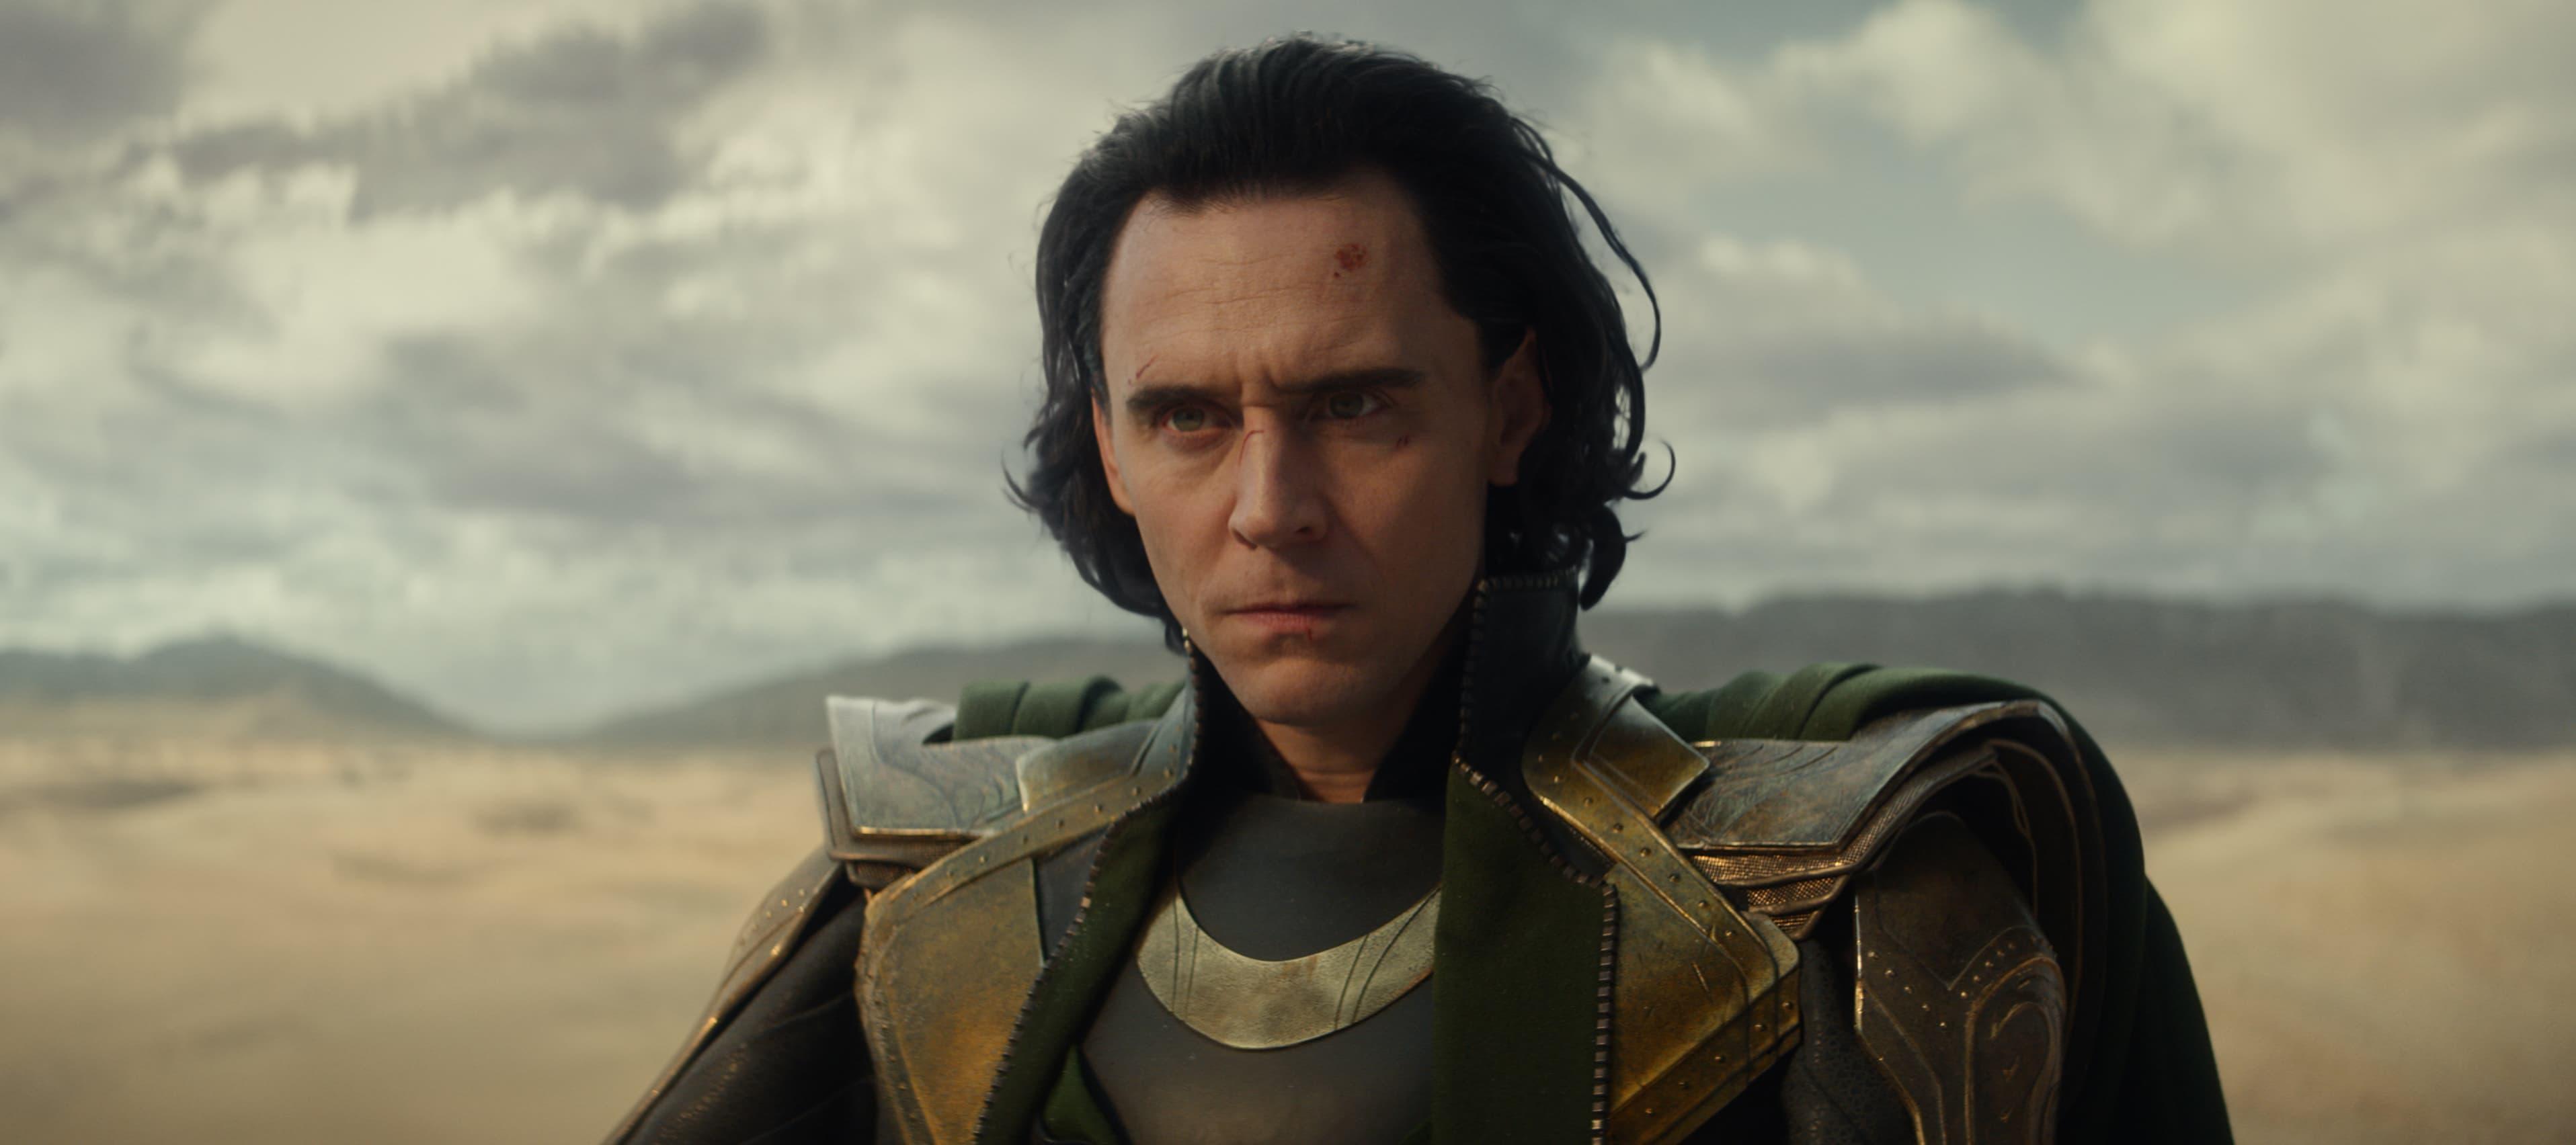 Marvel Studios' Loki Episode 1 Guide